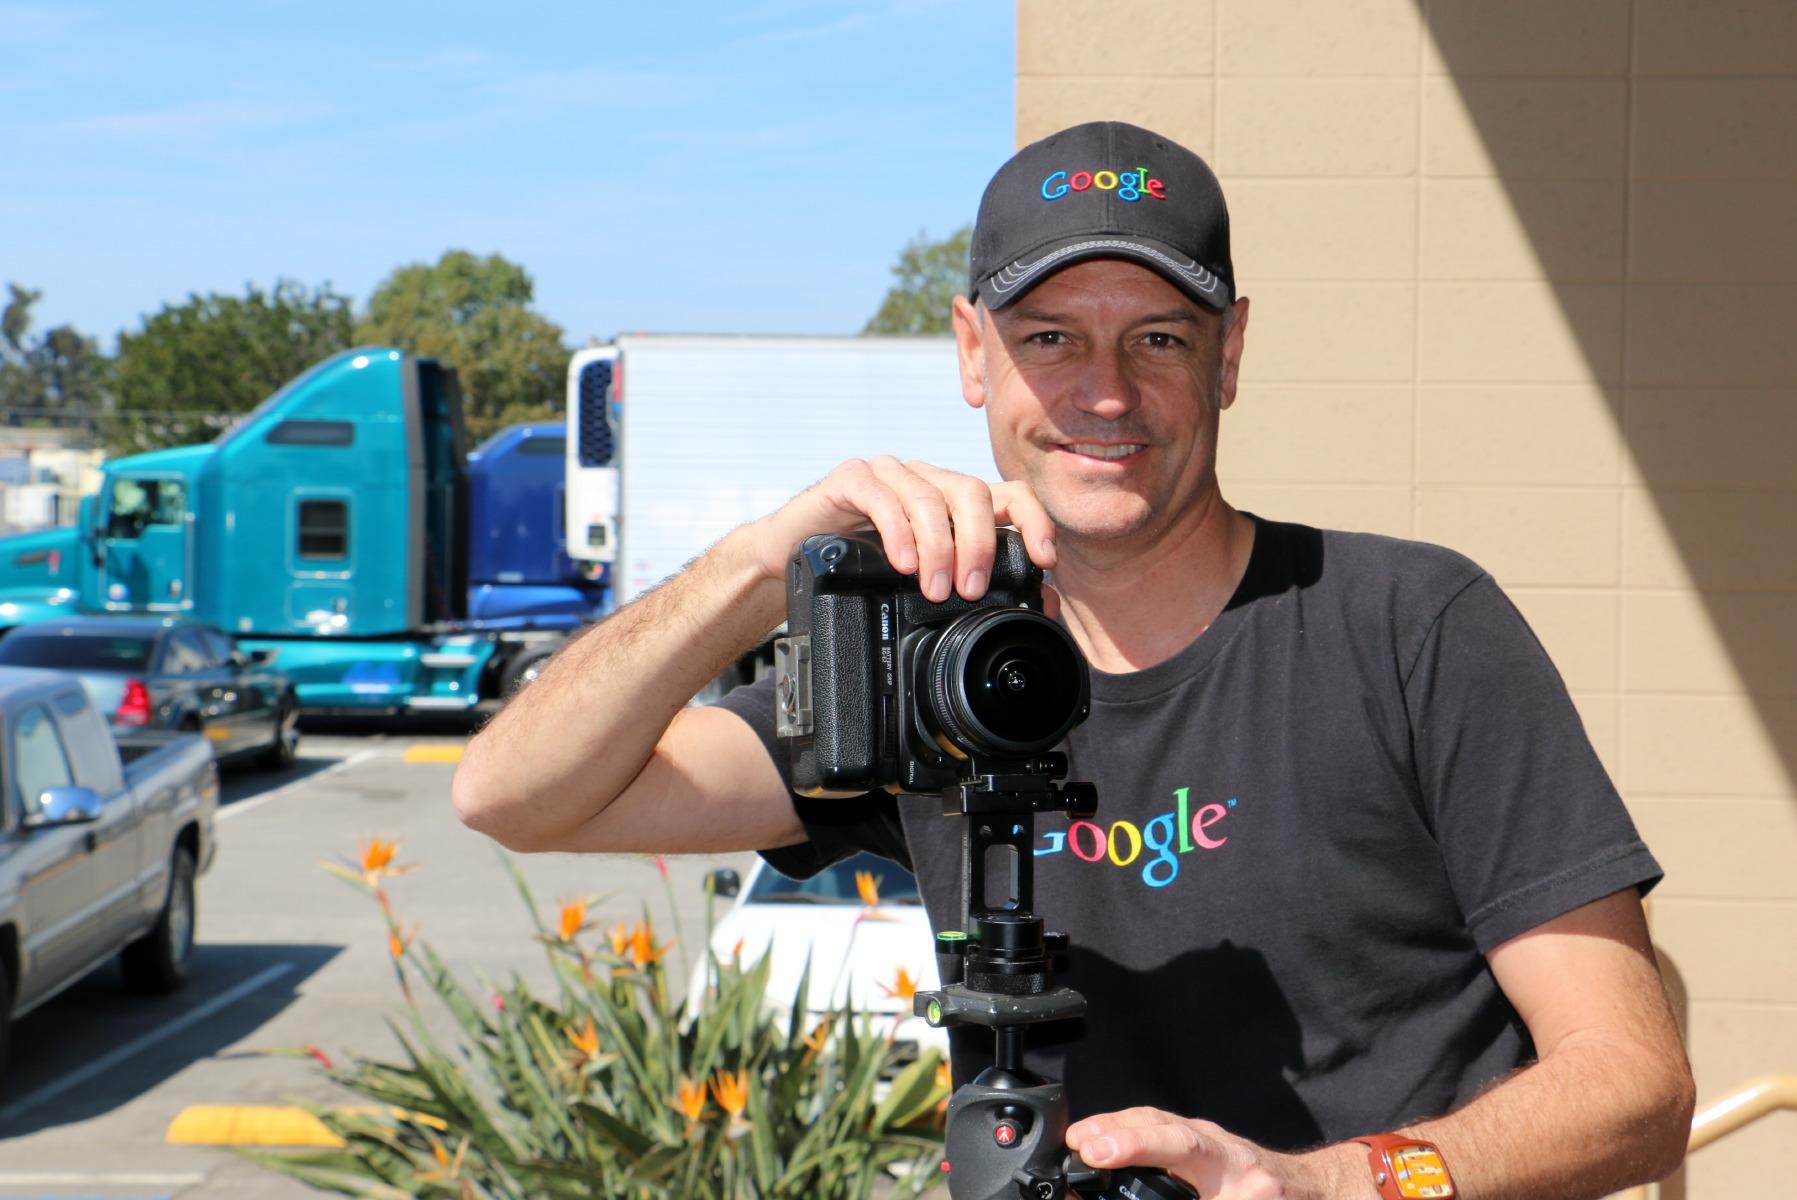 805 Productions, video & Google productions. Santa Barbara, CA United States & Paris, France.